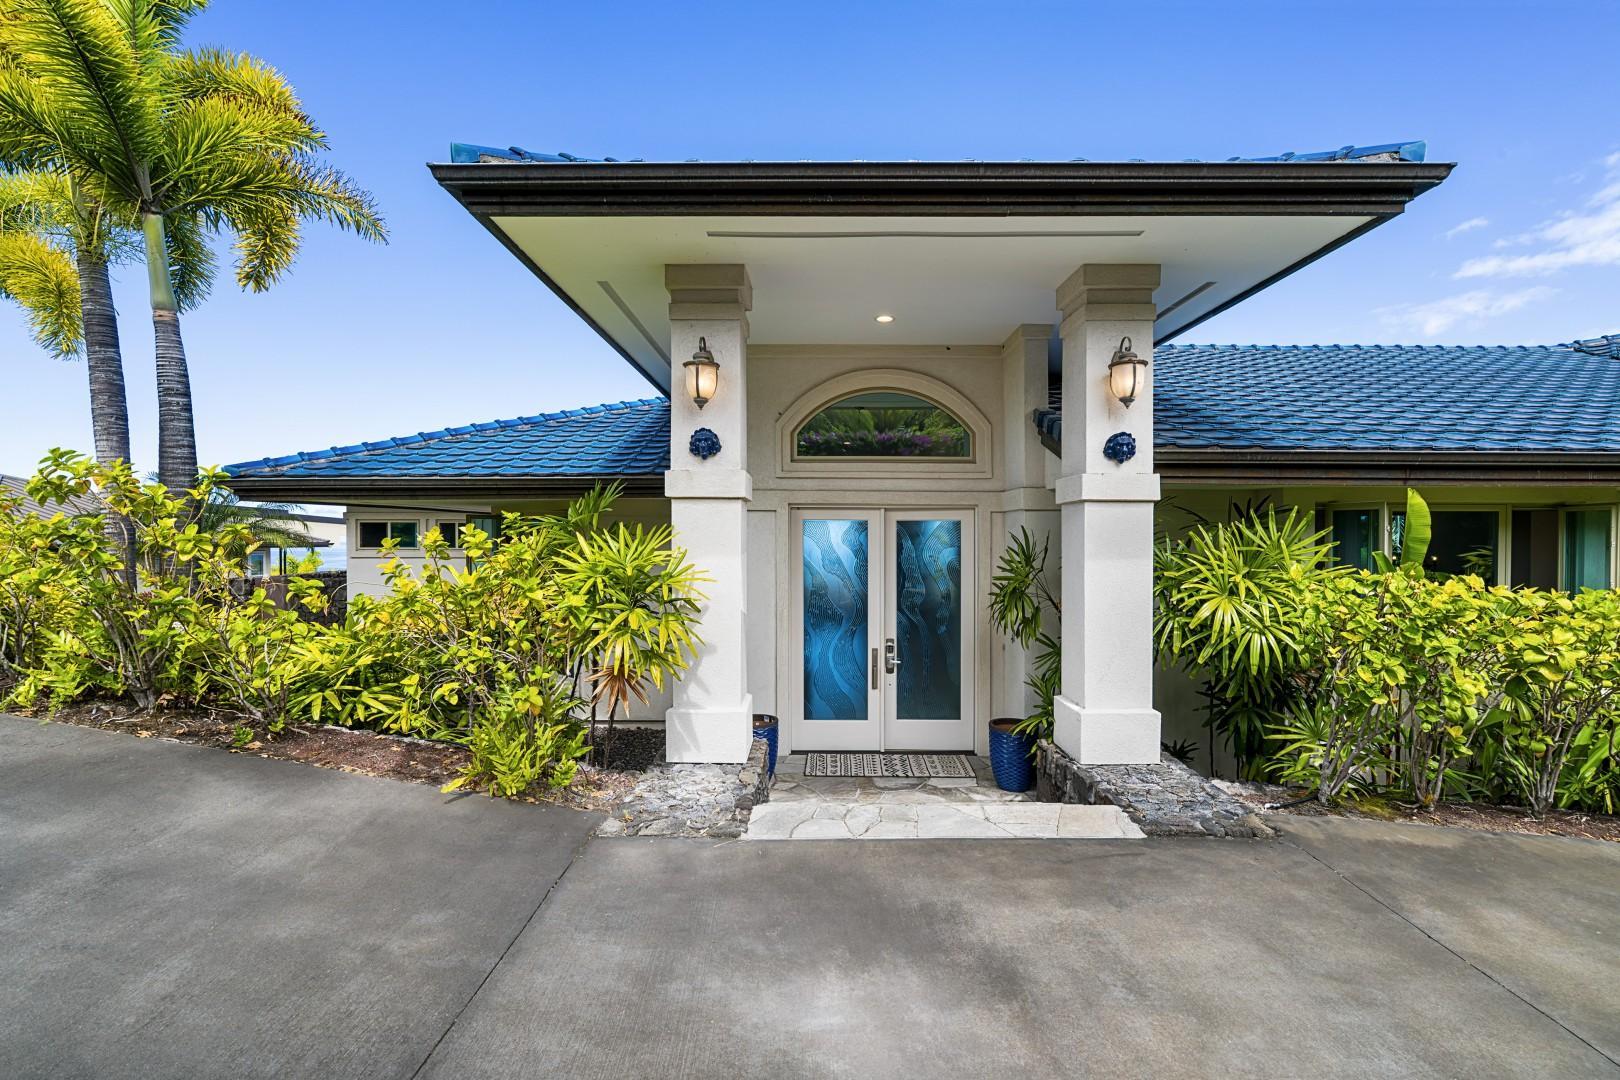 Entrance to Blue Hawaii